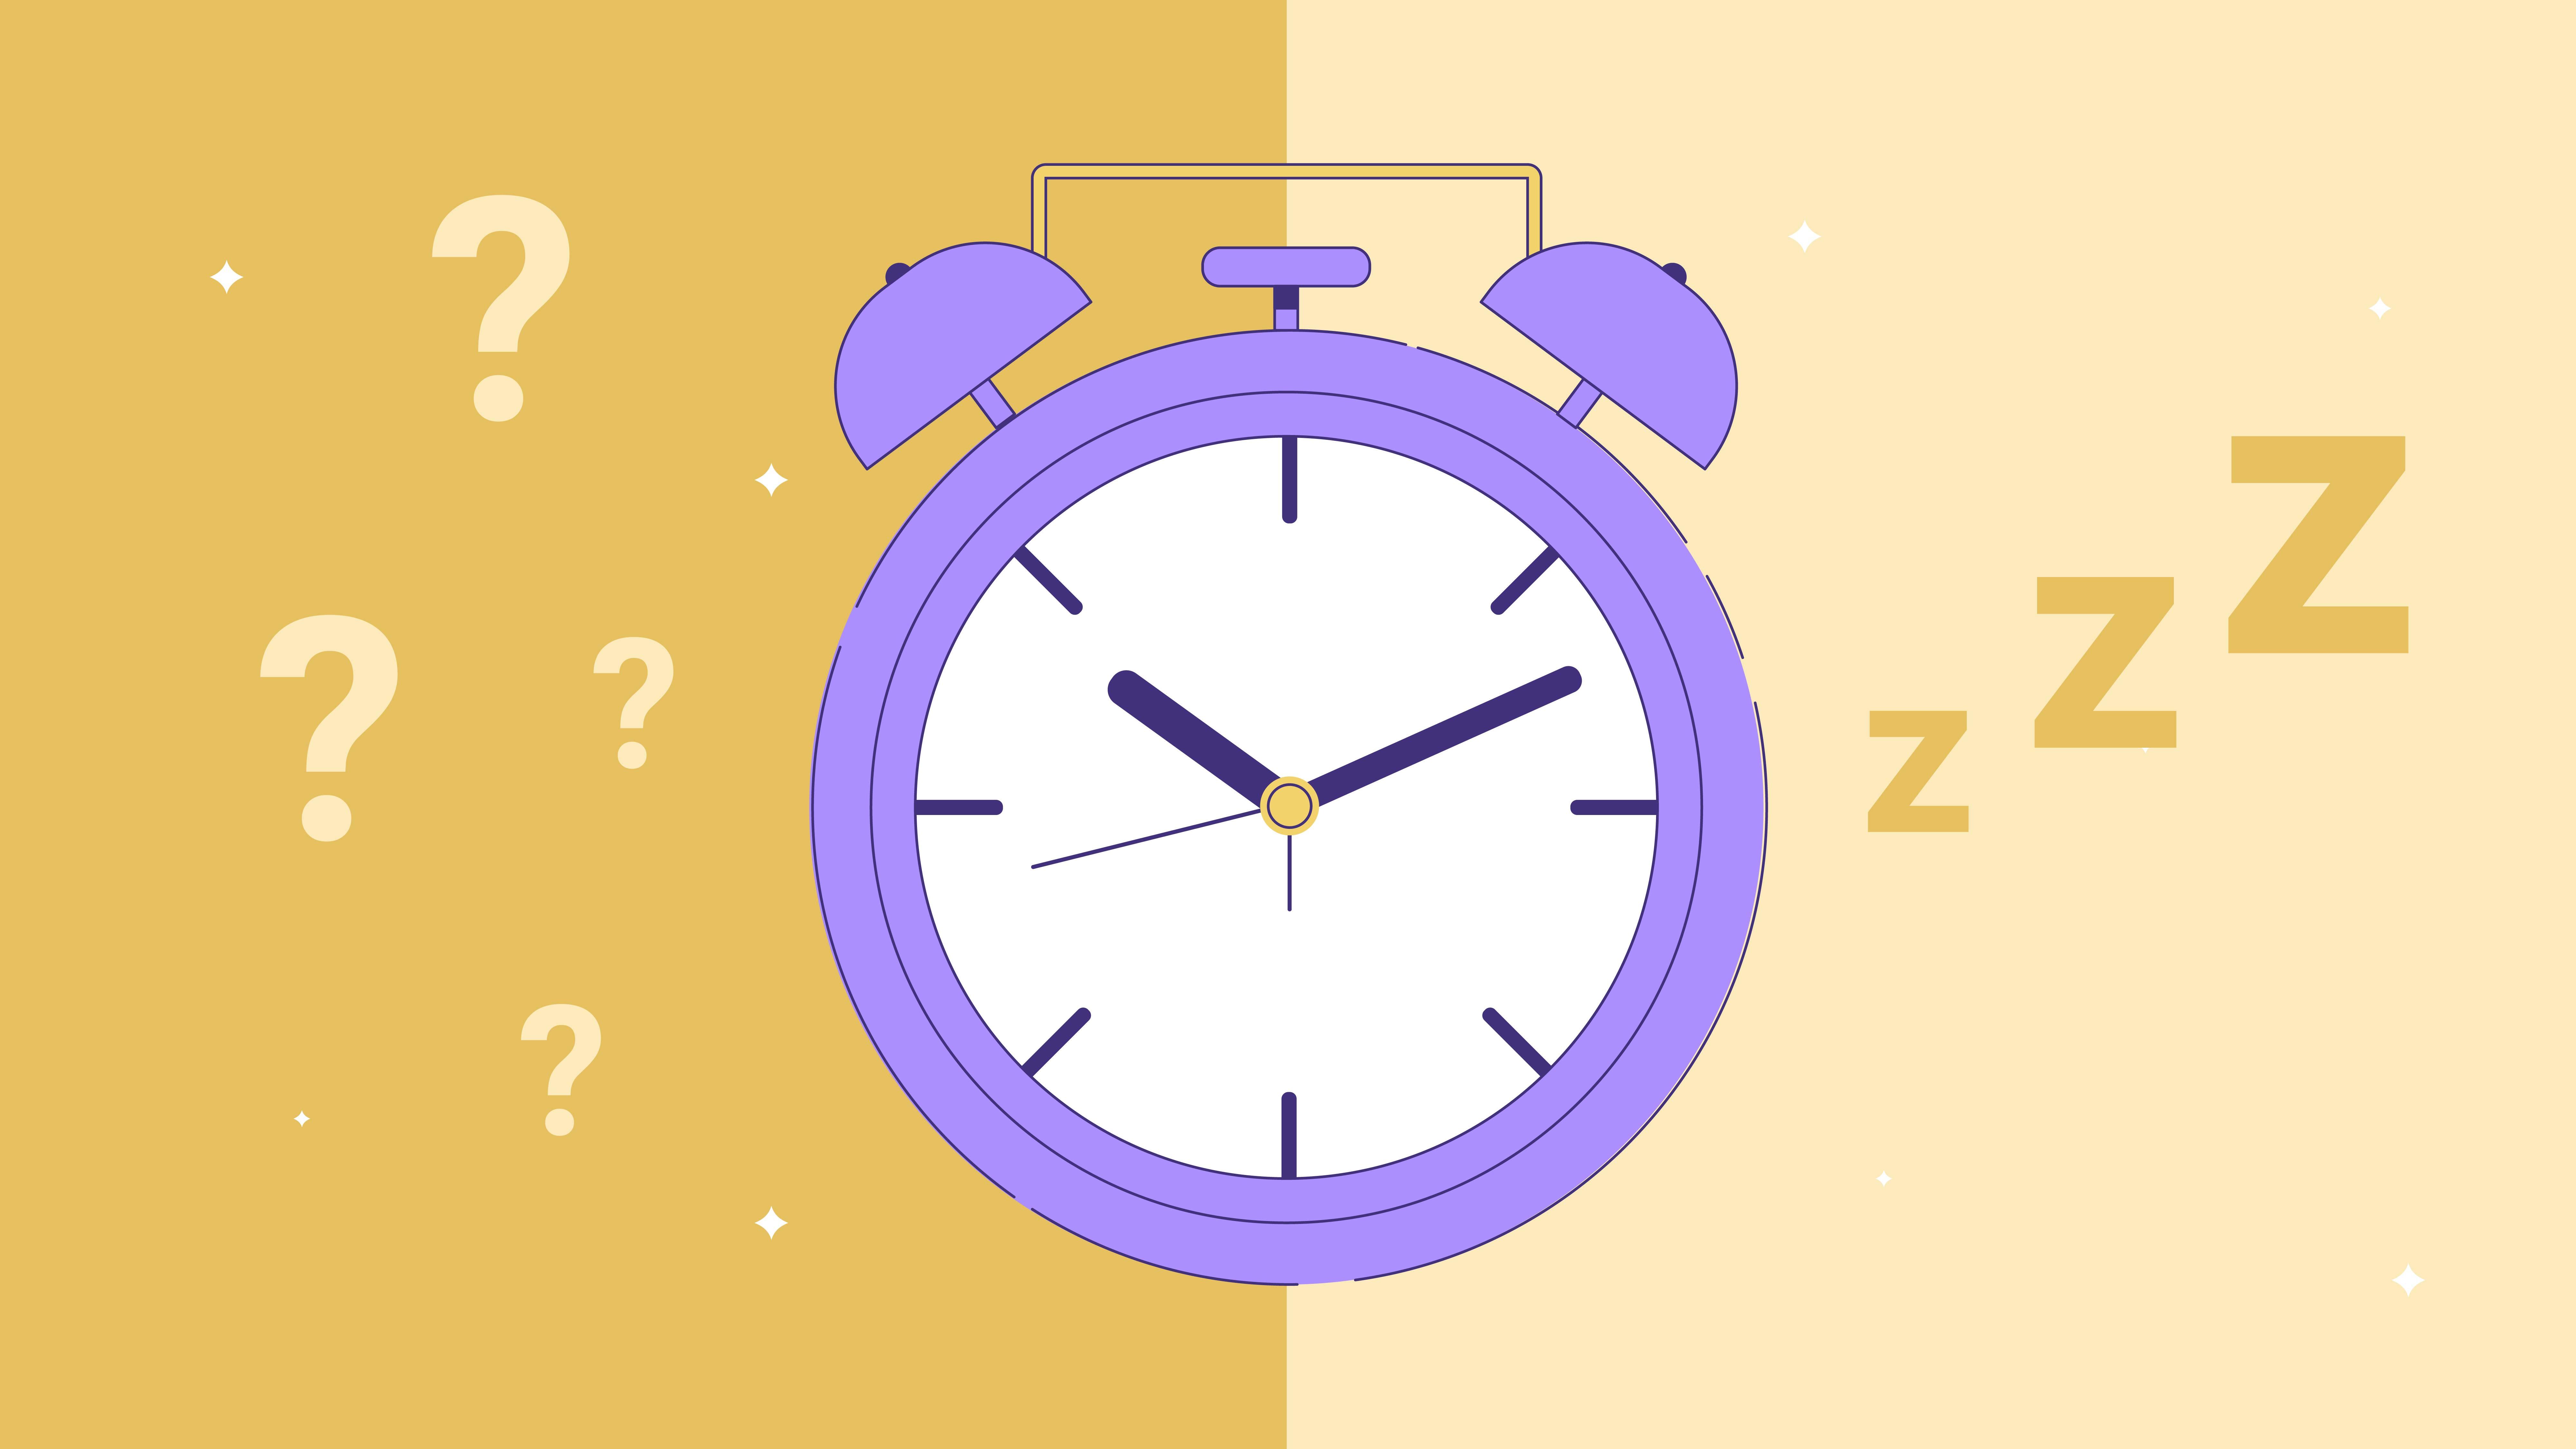 Light Sleepers vs. Heavy Sleepers